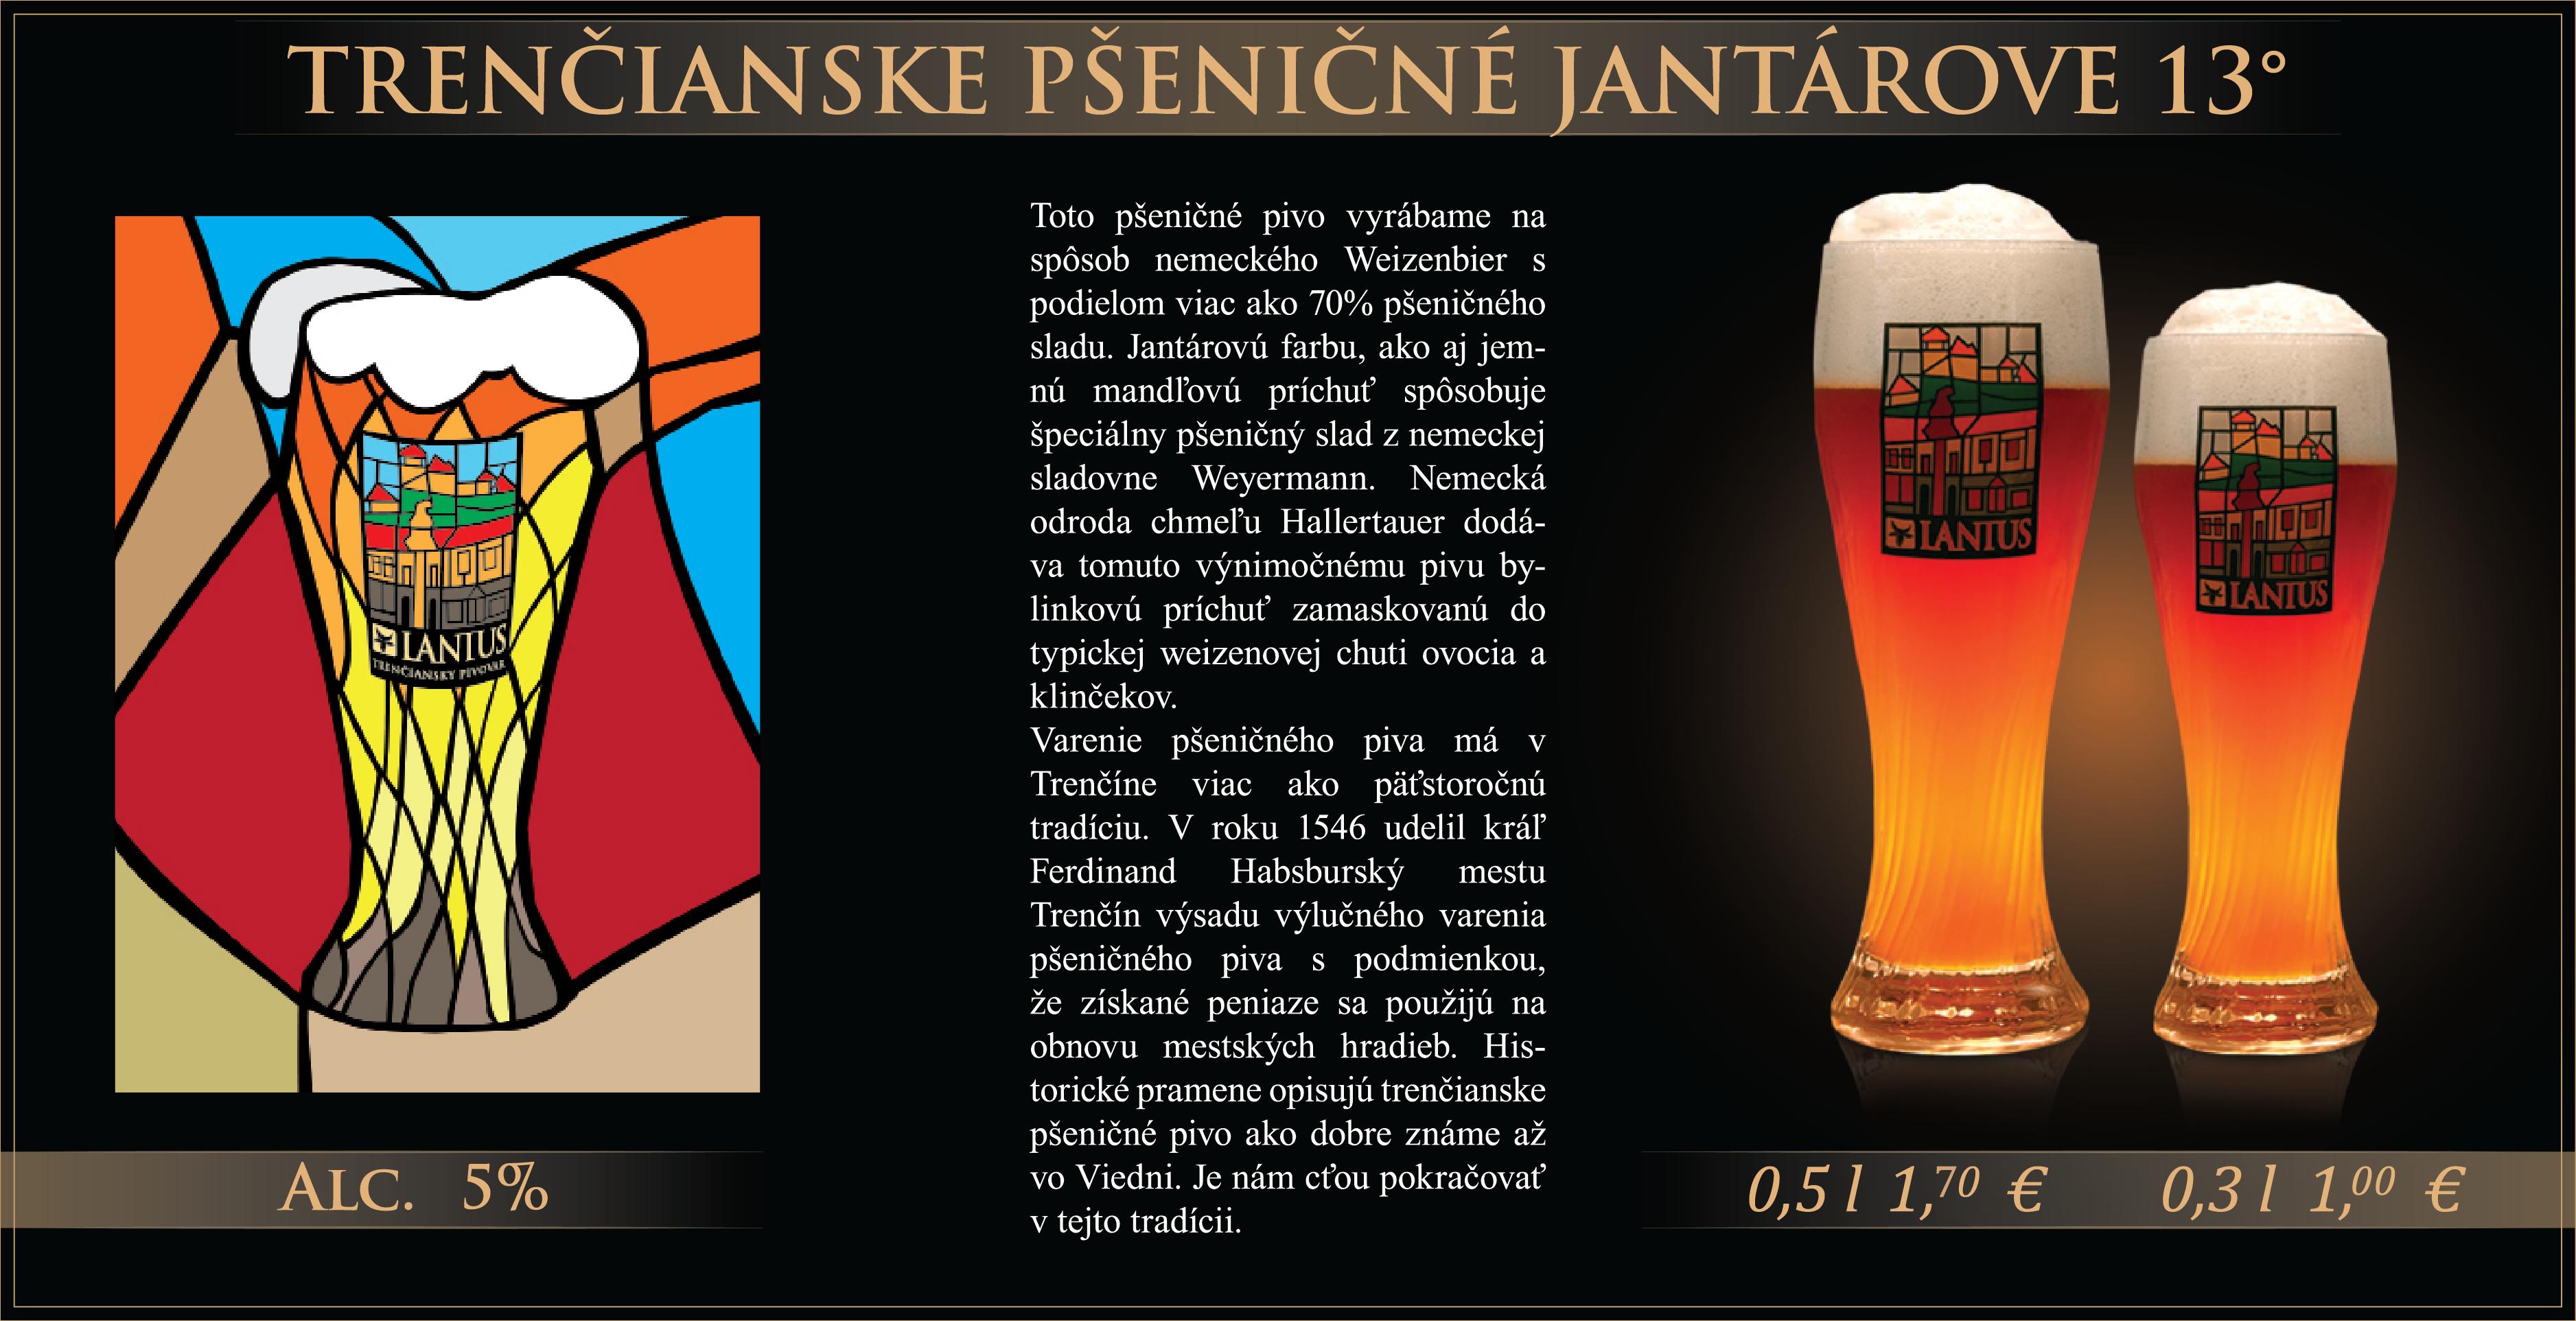 trenč.psenic.jantar_web-01-01